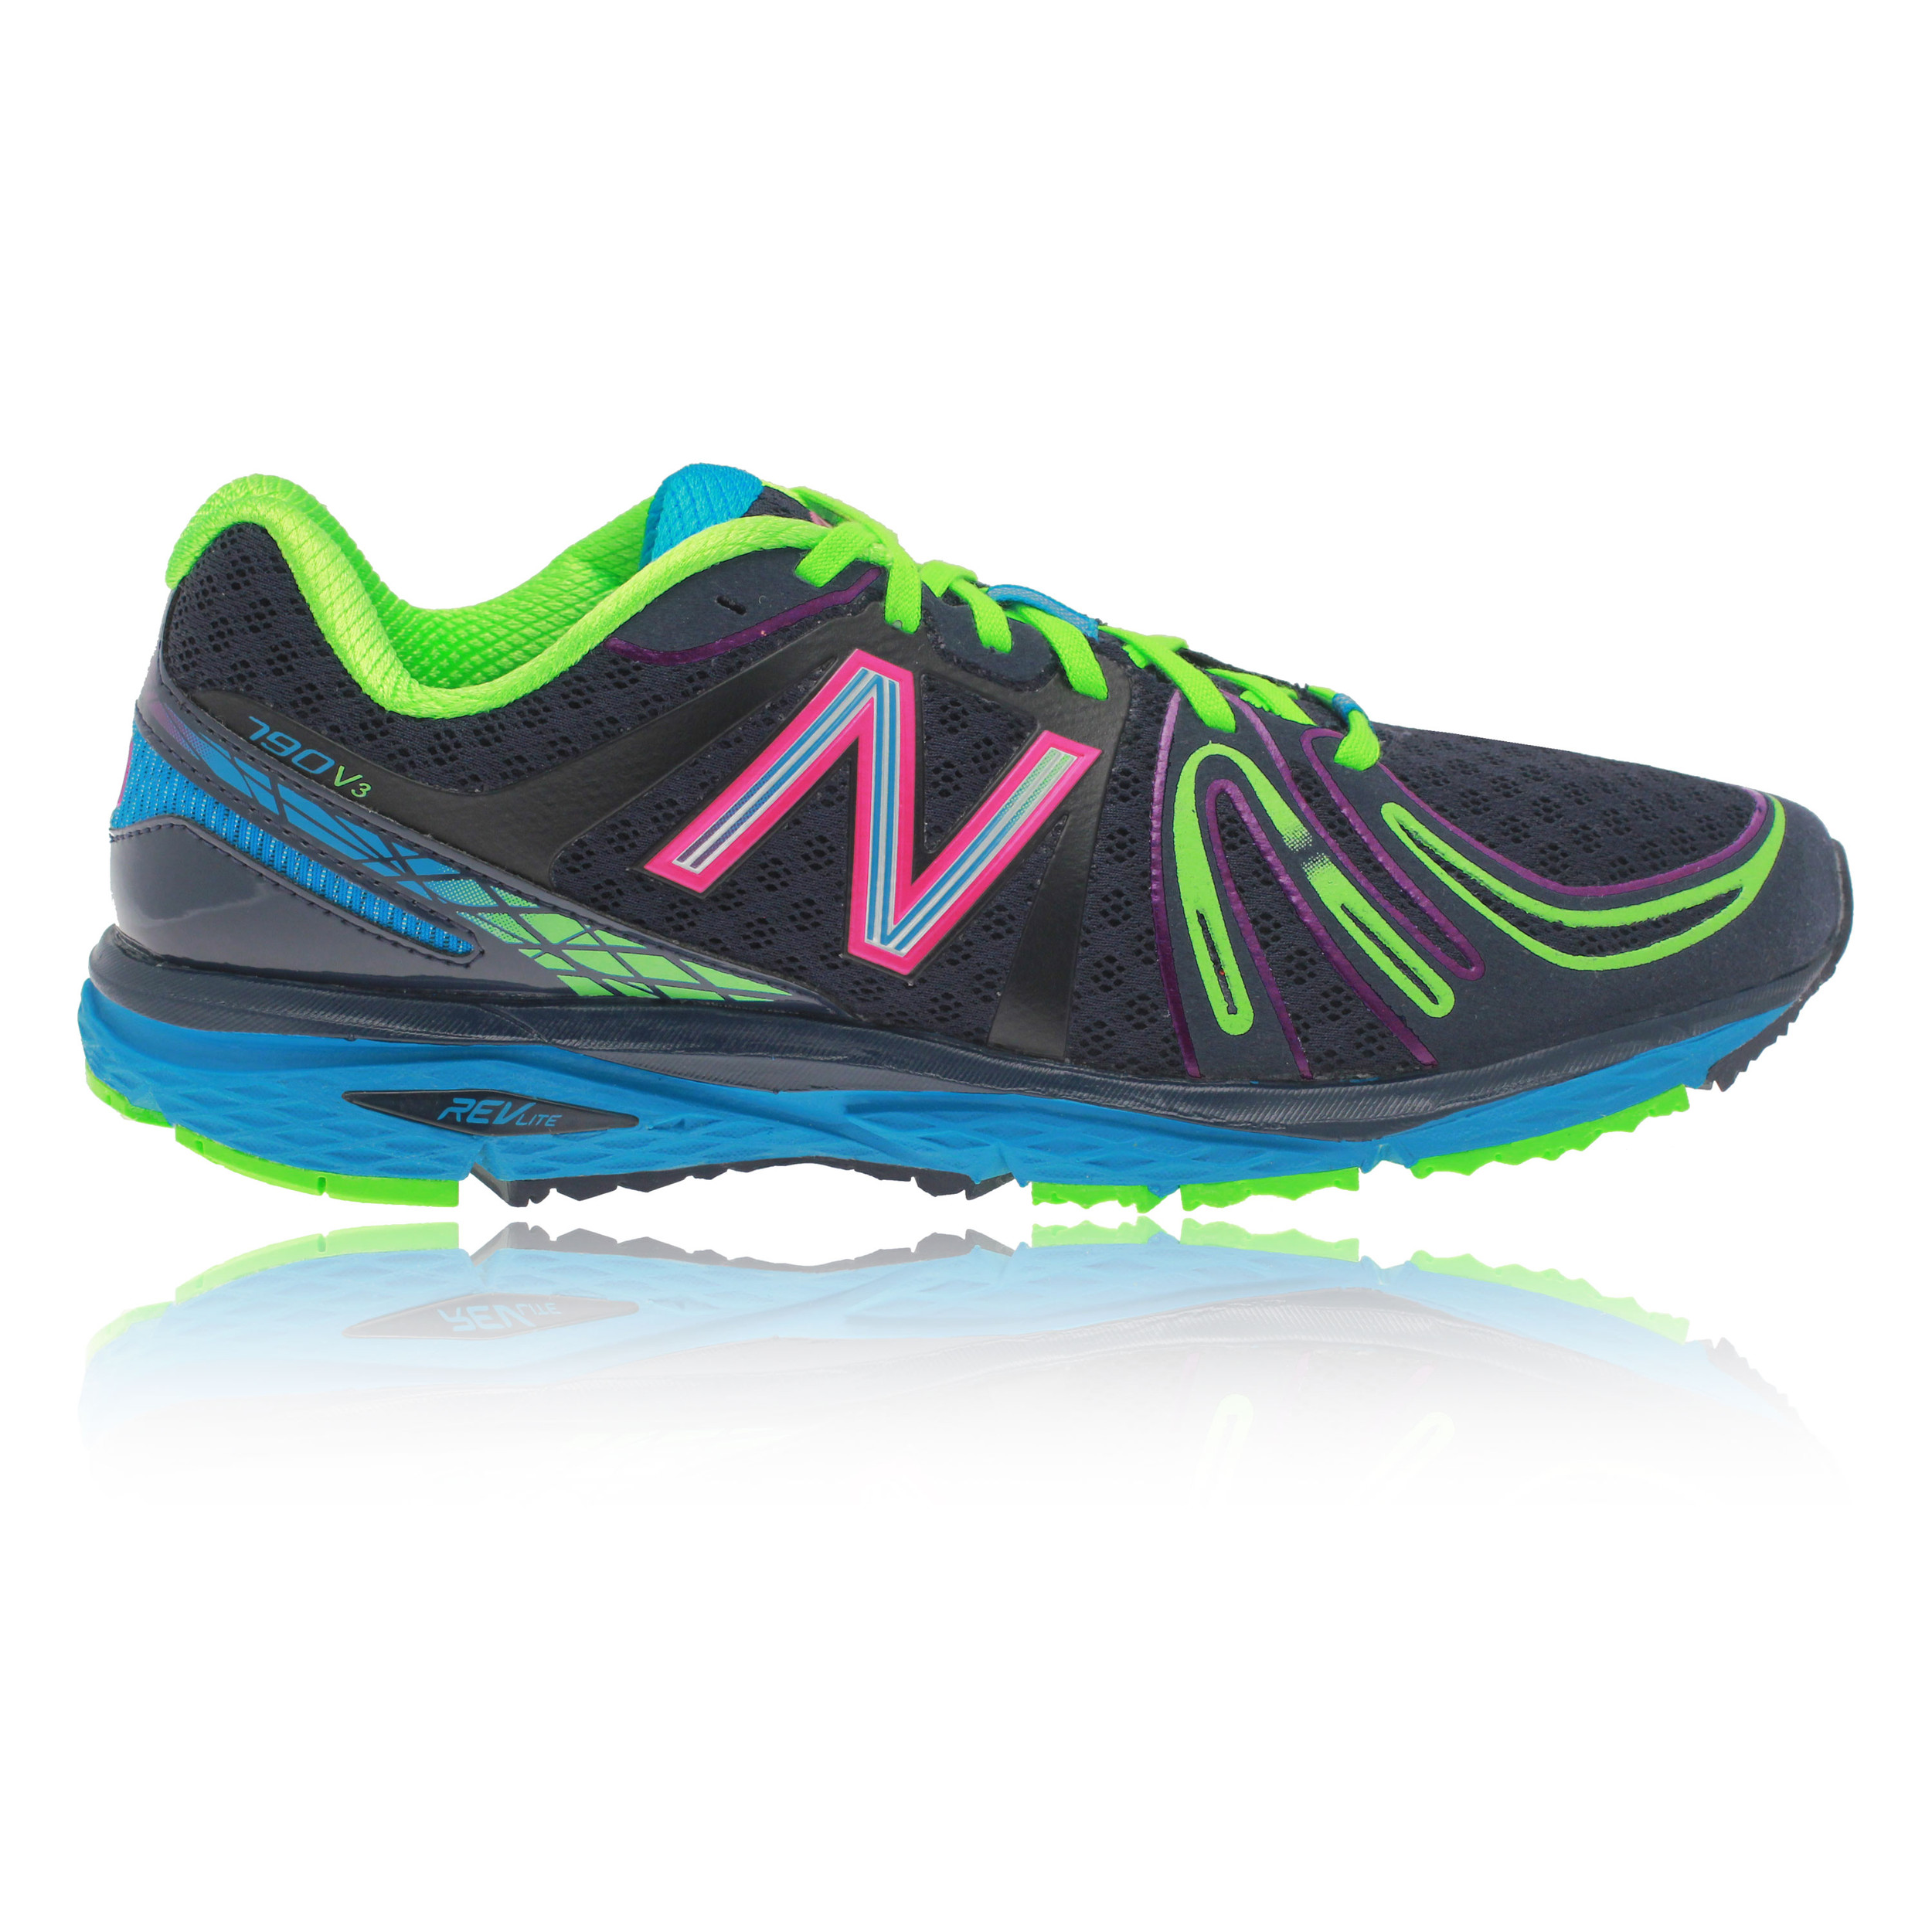 New Balance M790 v3 Running Shoes (D Width)